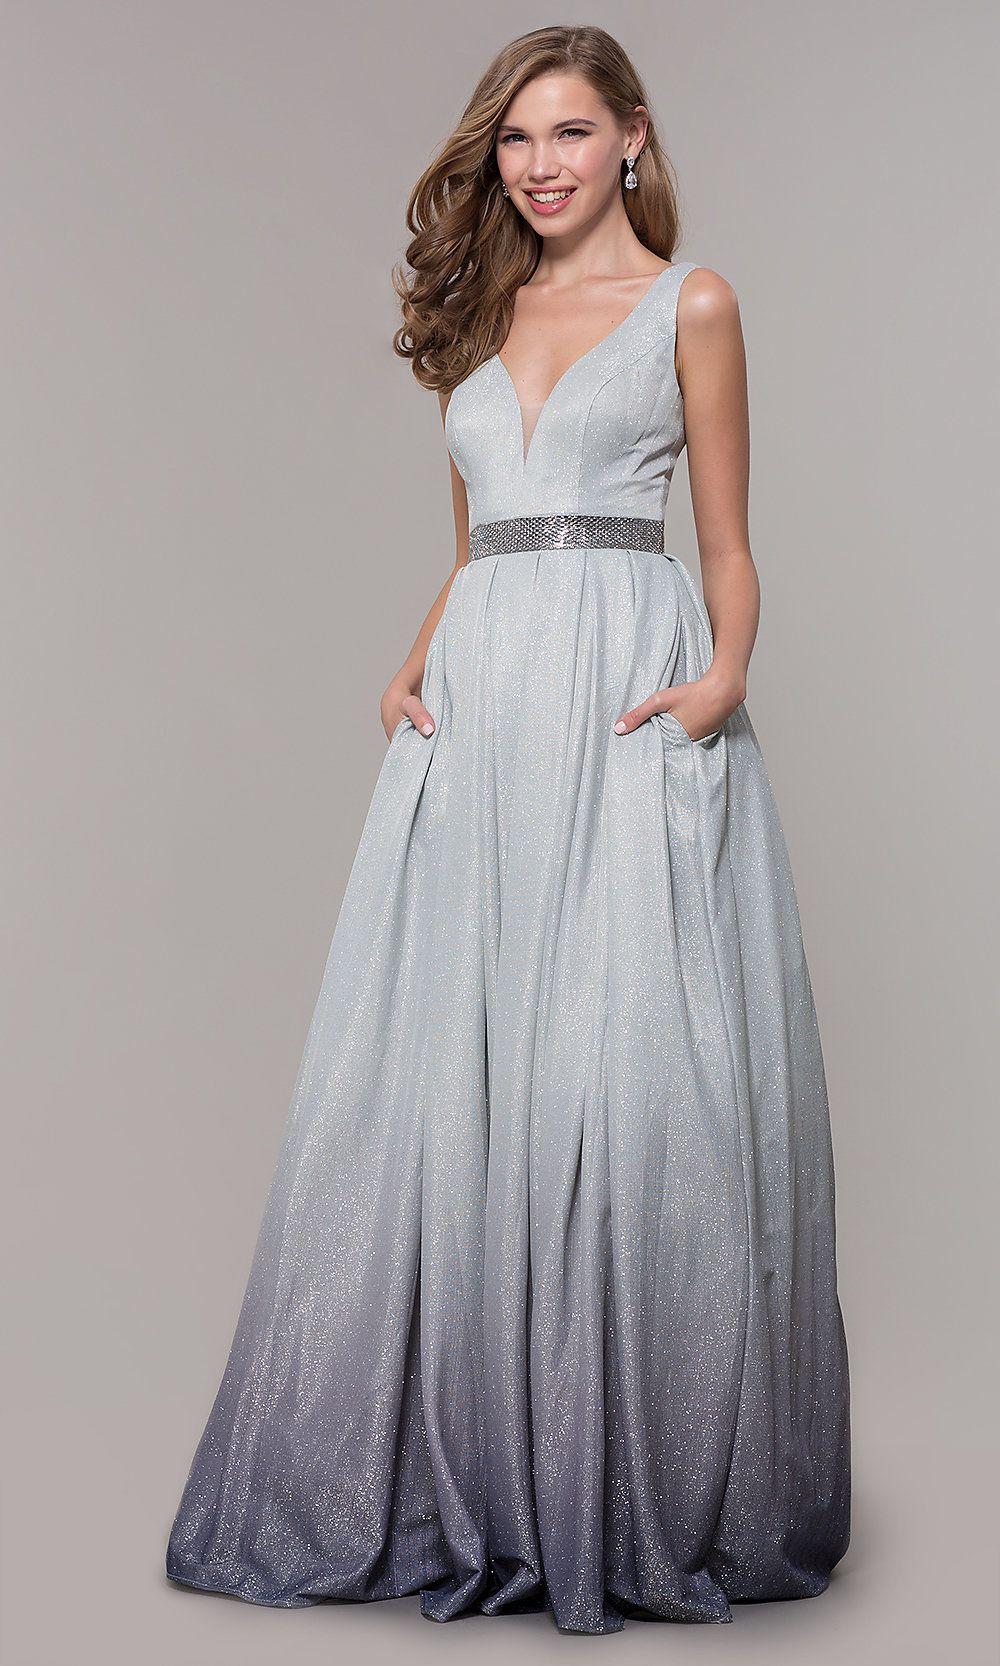 7cbfd0382f5 Grey Ombre Prom Dress - Gomes Weine AG